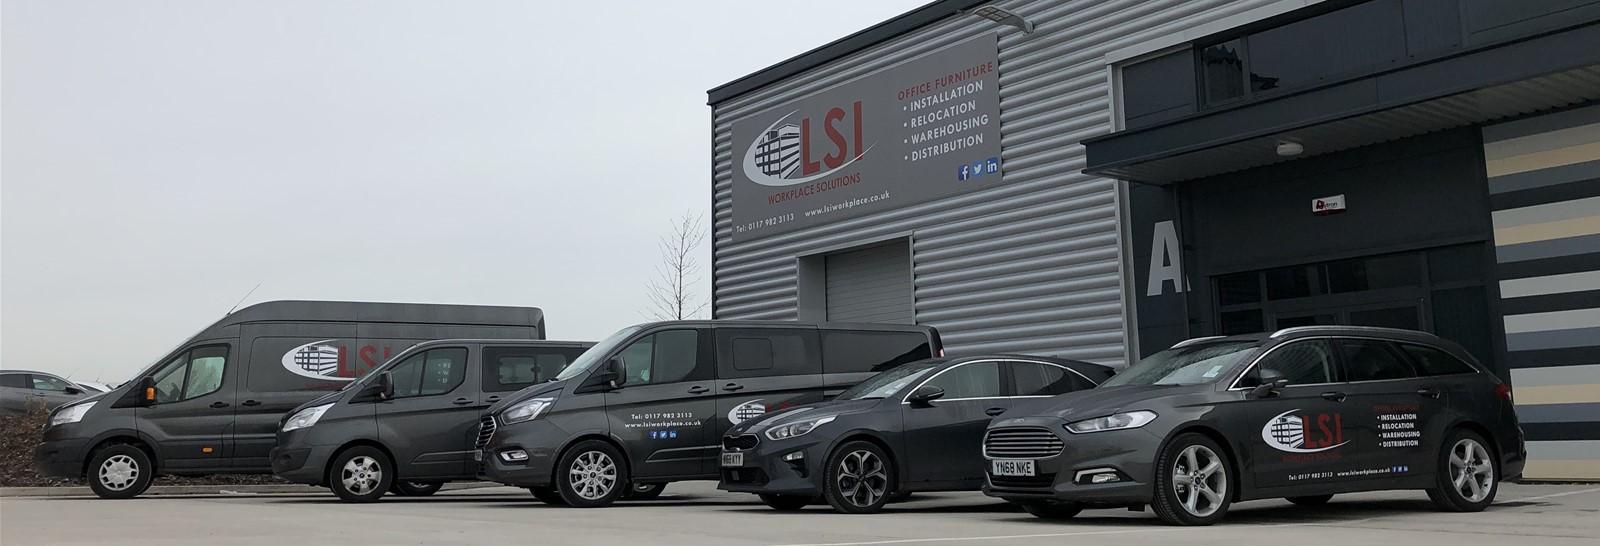 Fascia sign and fleet vehicle graphics